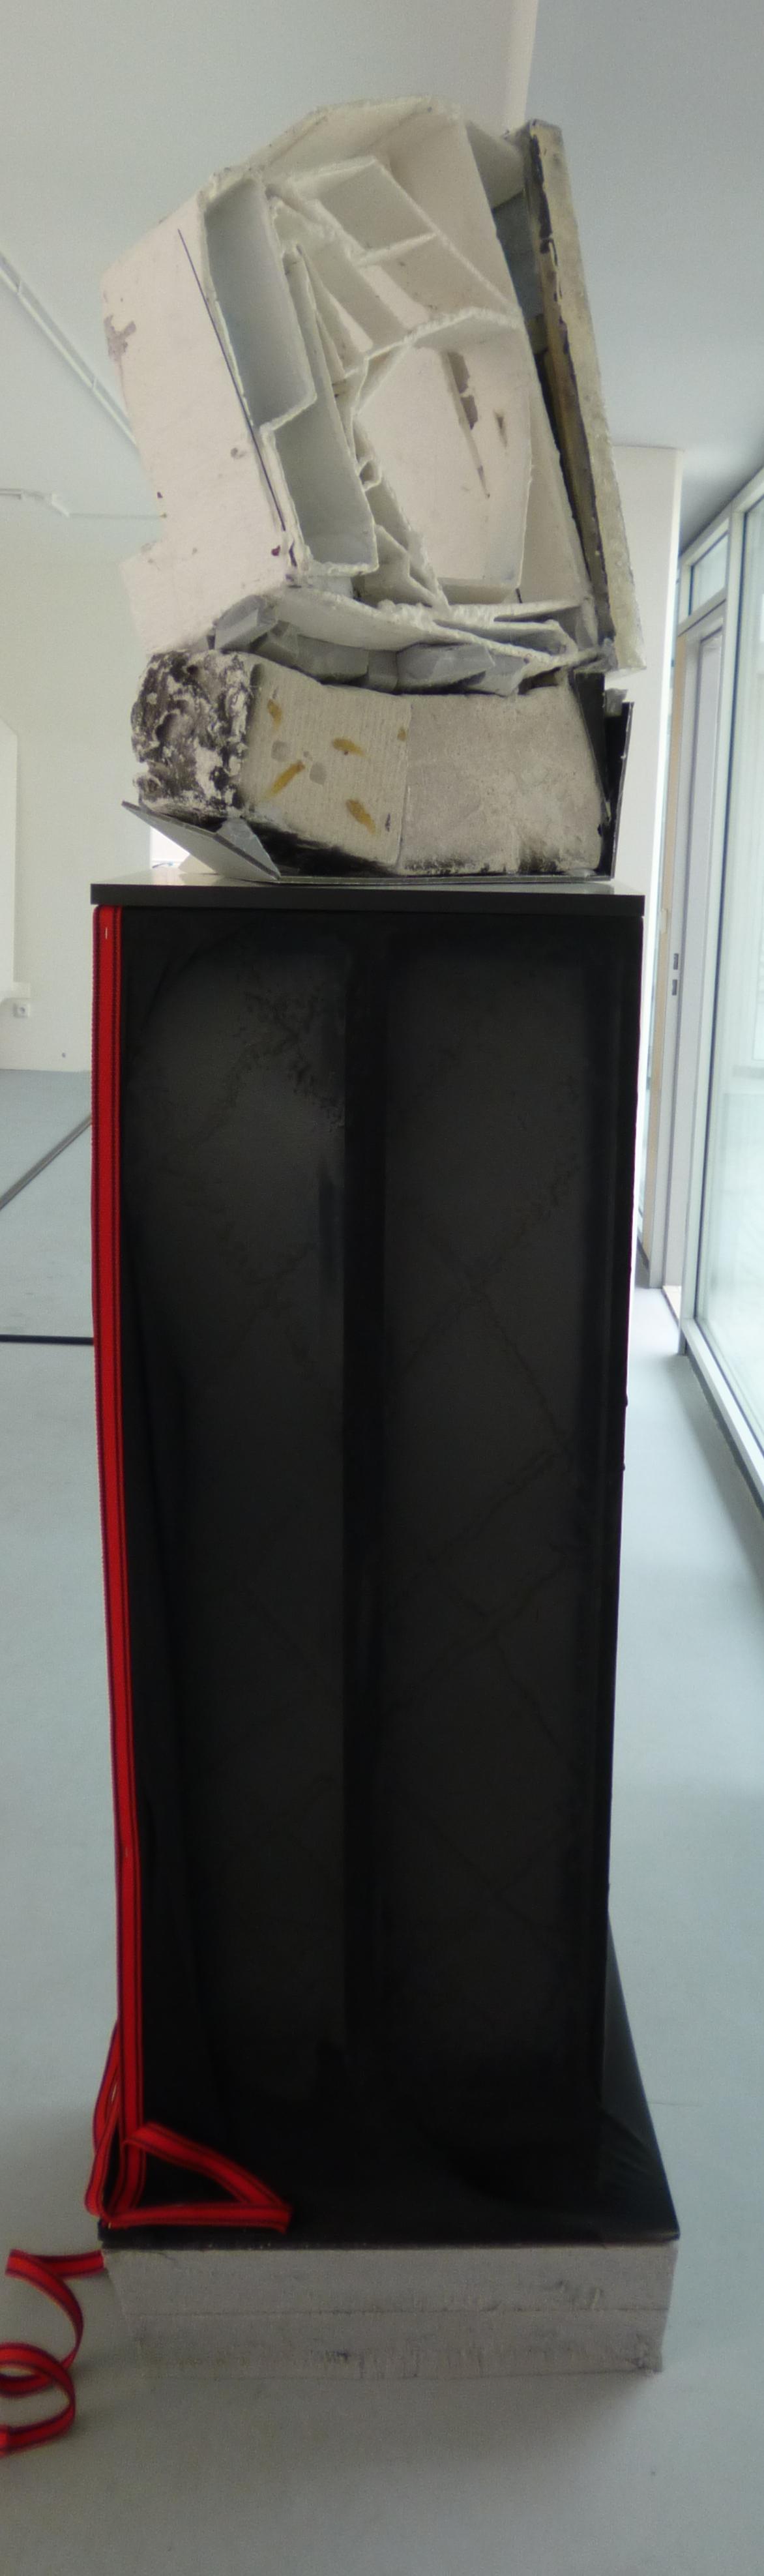 5.Sochařské cvičení II., 2015, (Dvě barvy na opravu), 2015, kom. technika, 60 x 213 x 60